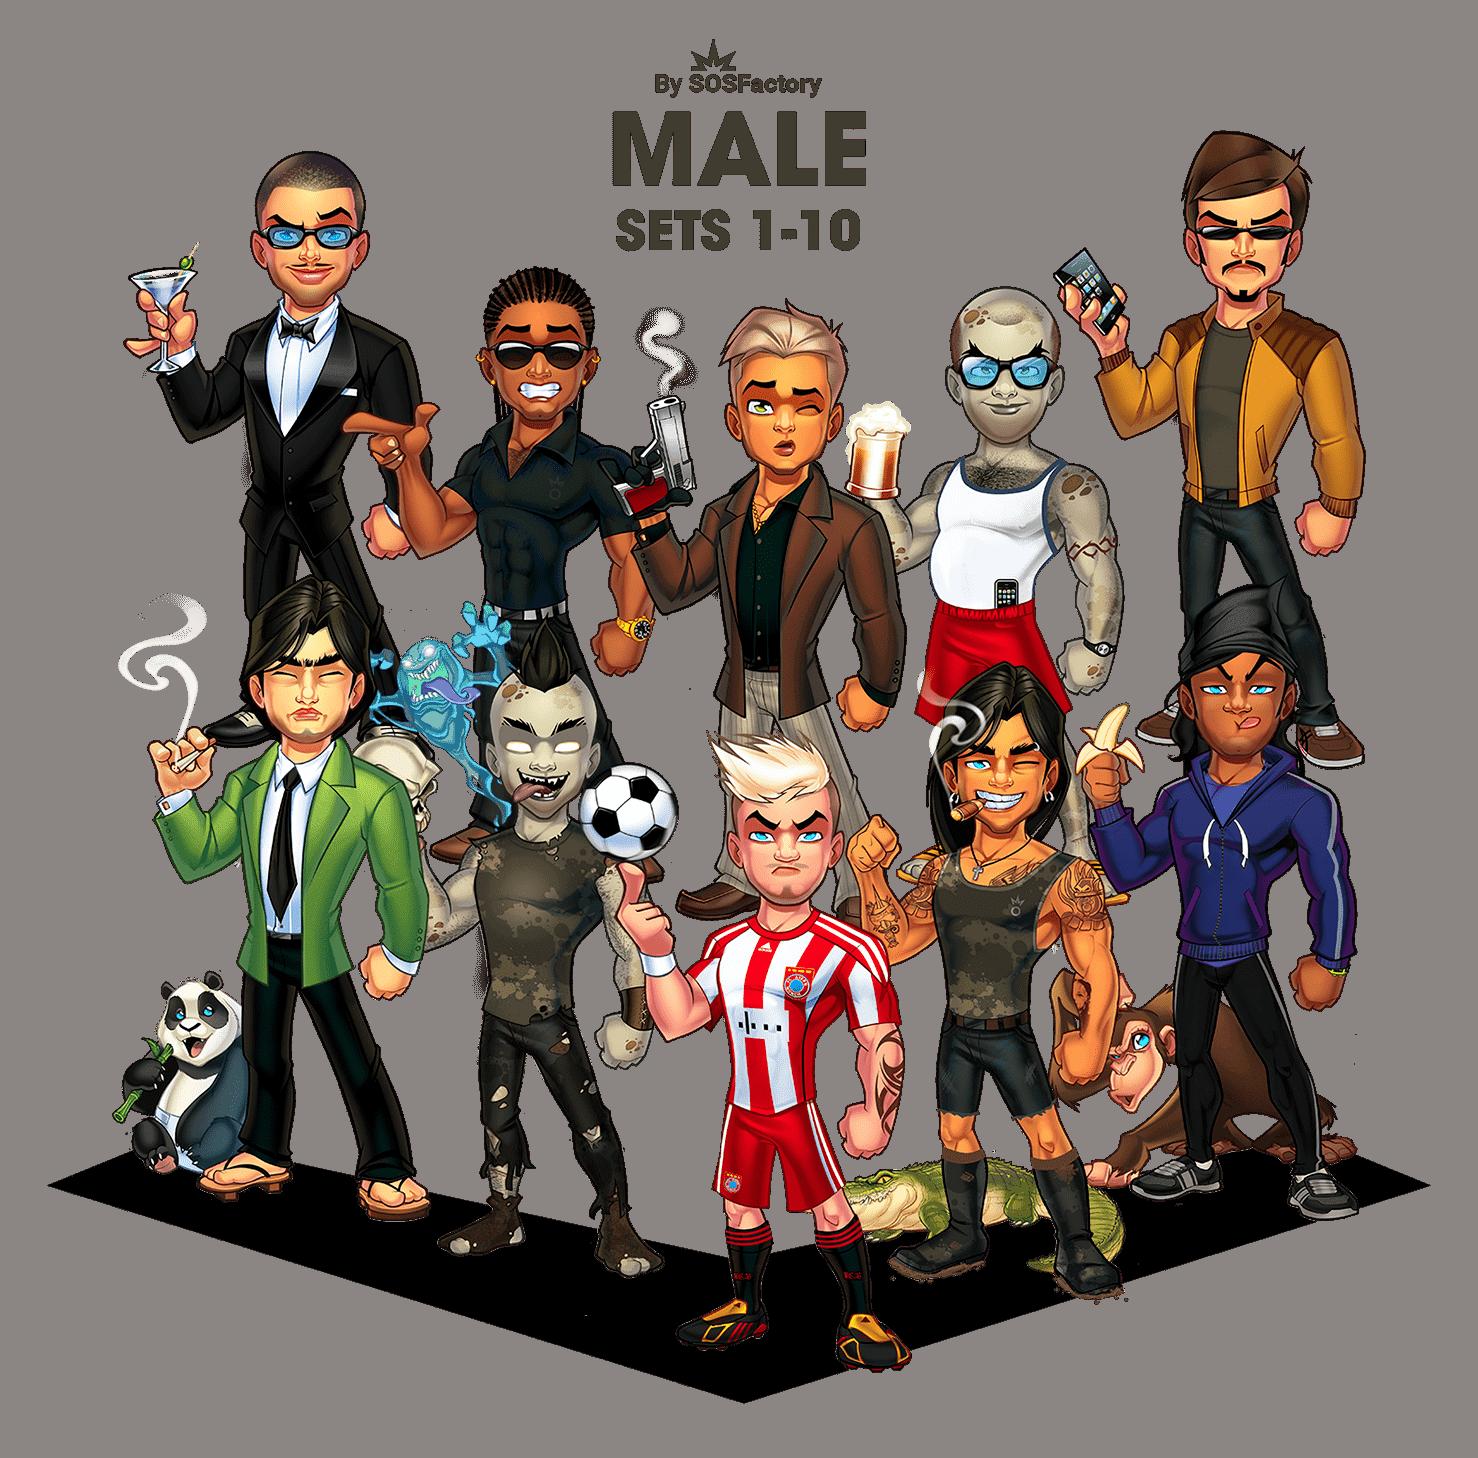 male avatar creator 1-10